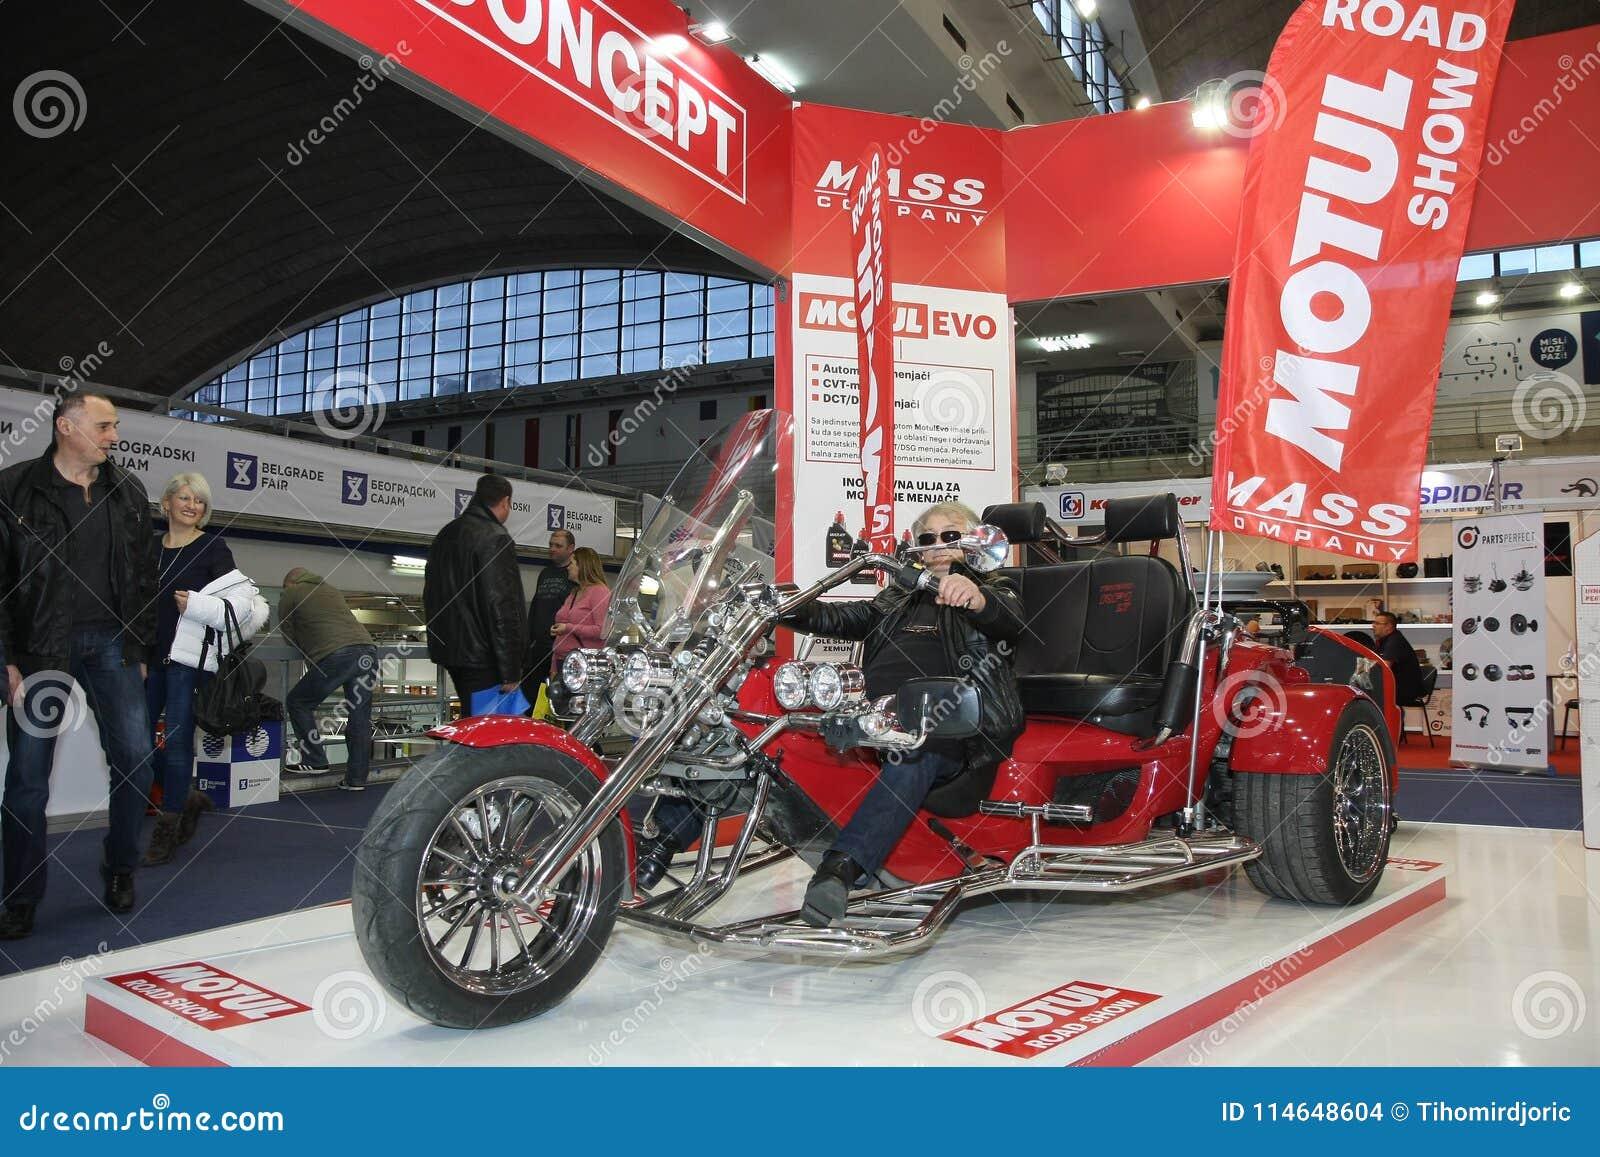 Motul At Belgrade Car Show Editorial Stock Image Image Of Trike - Car show wheel stands